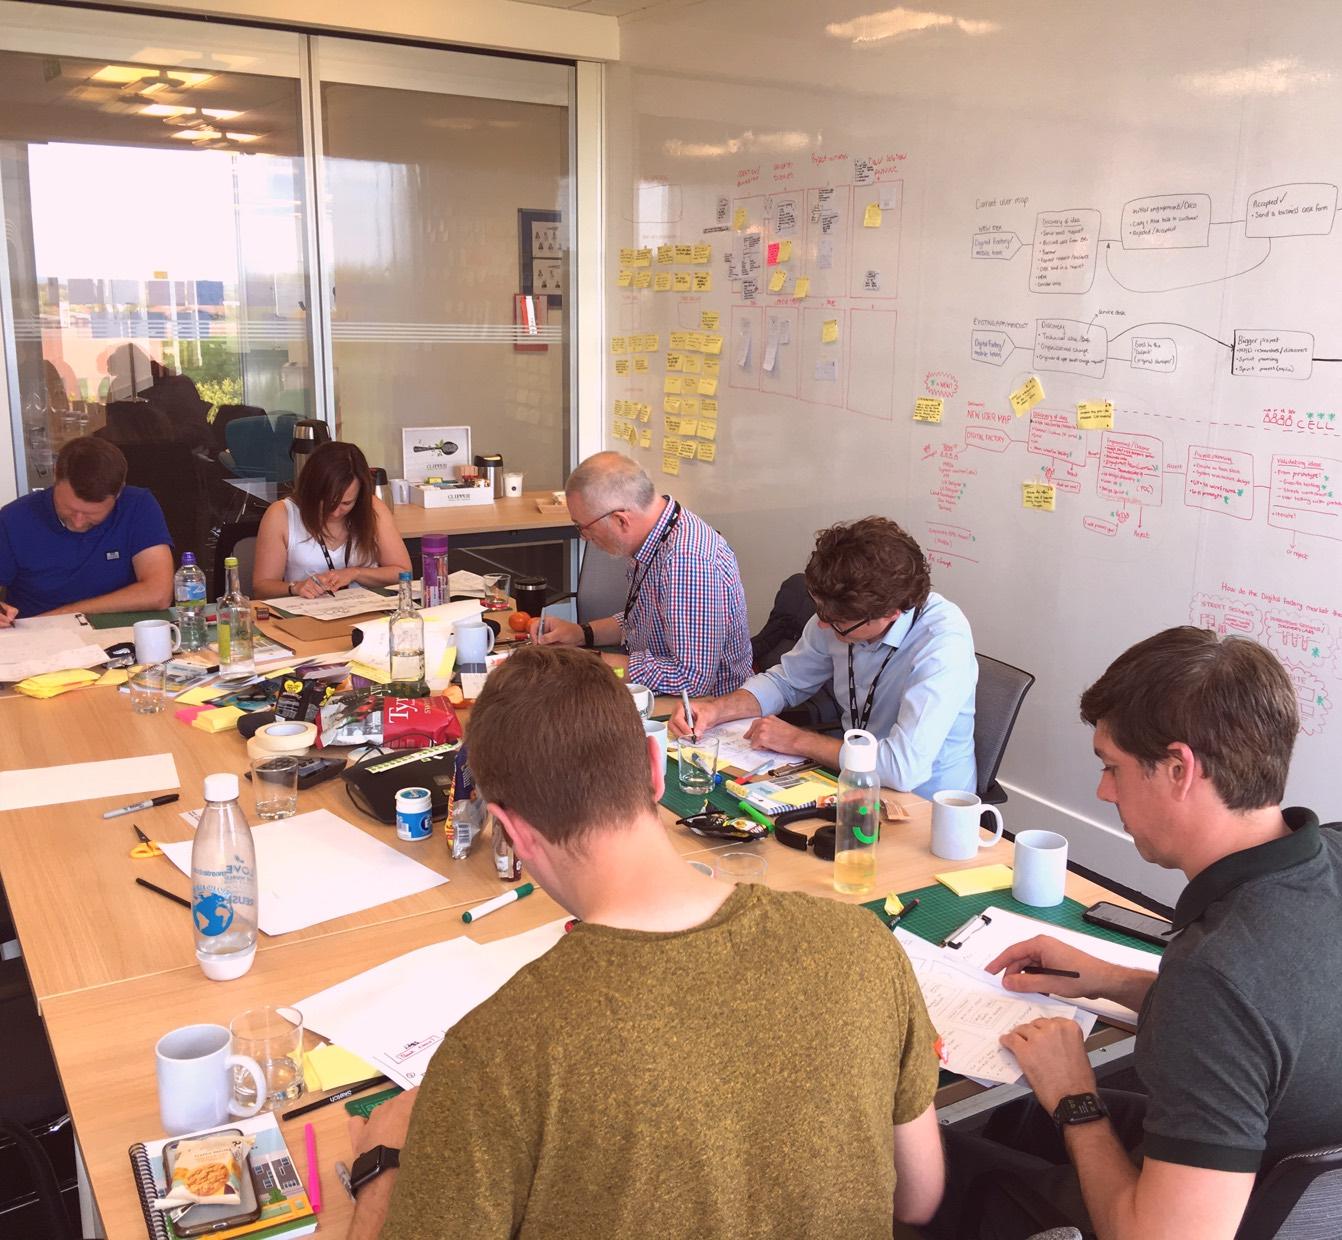 Design Sprint for teams